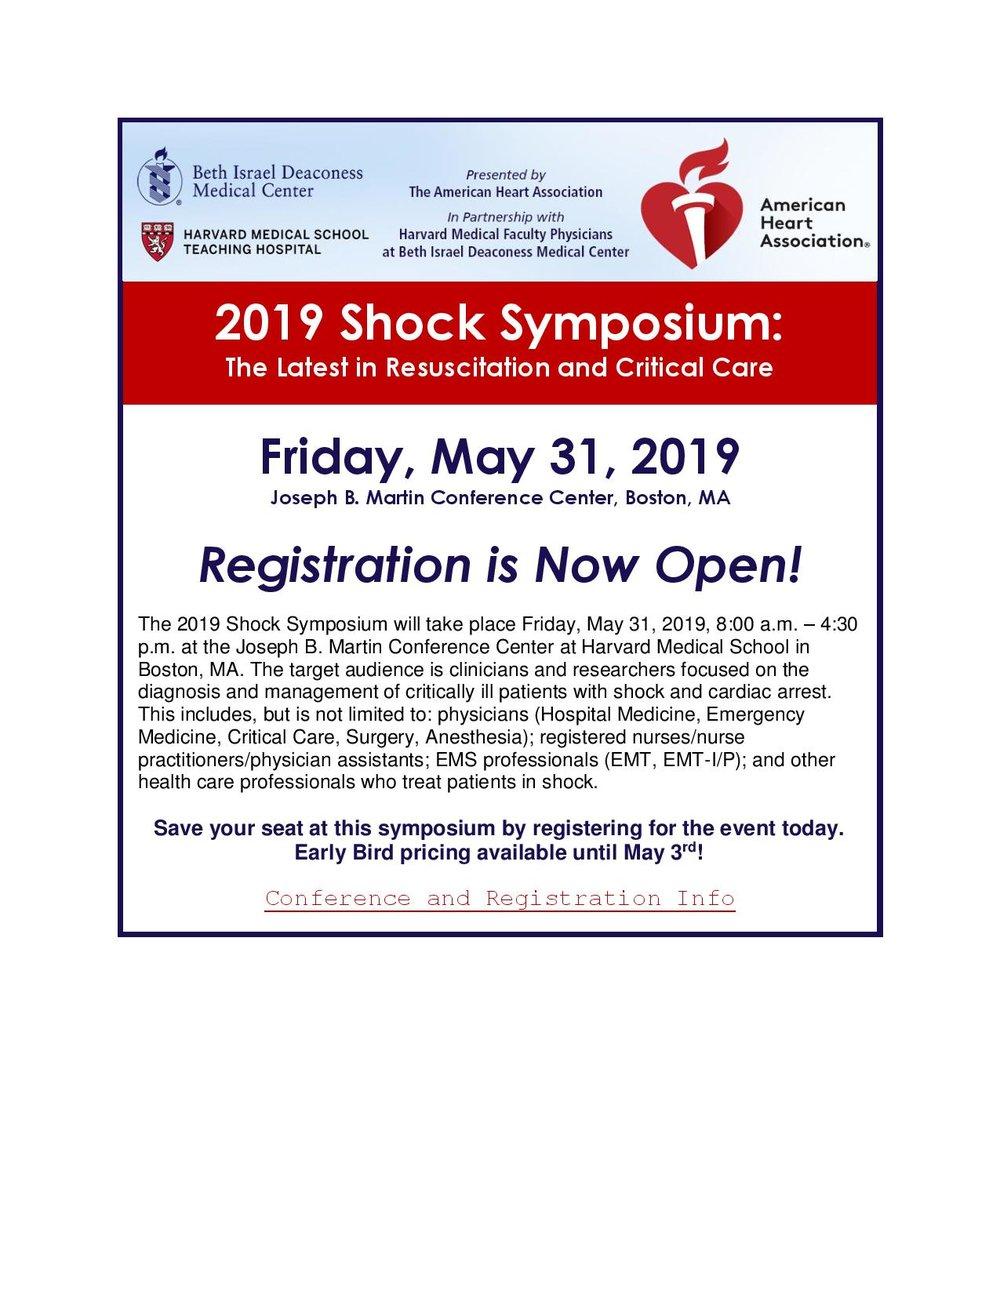 2019 Shock Symposium flyer-page-001.jpg